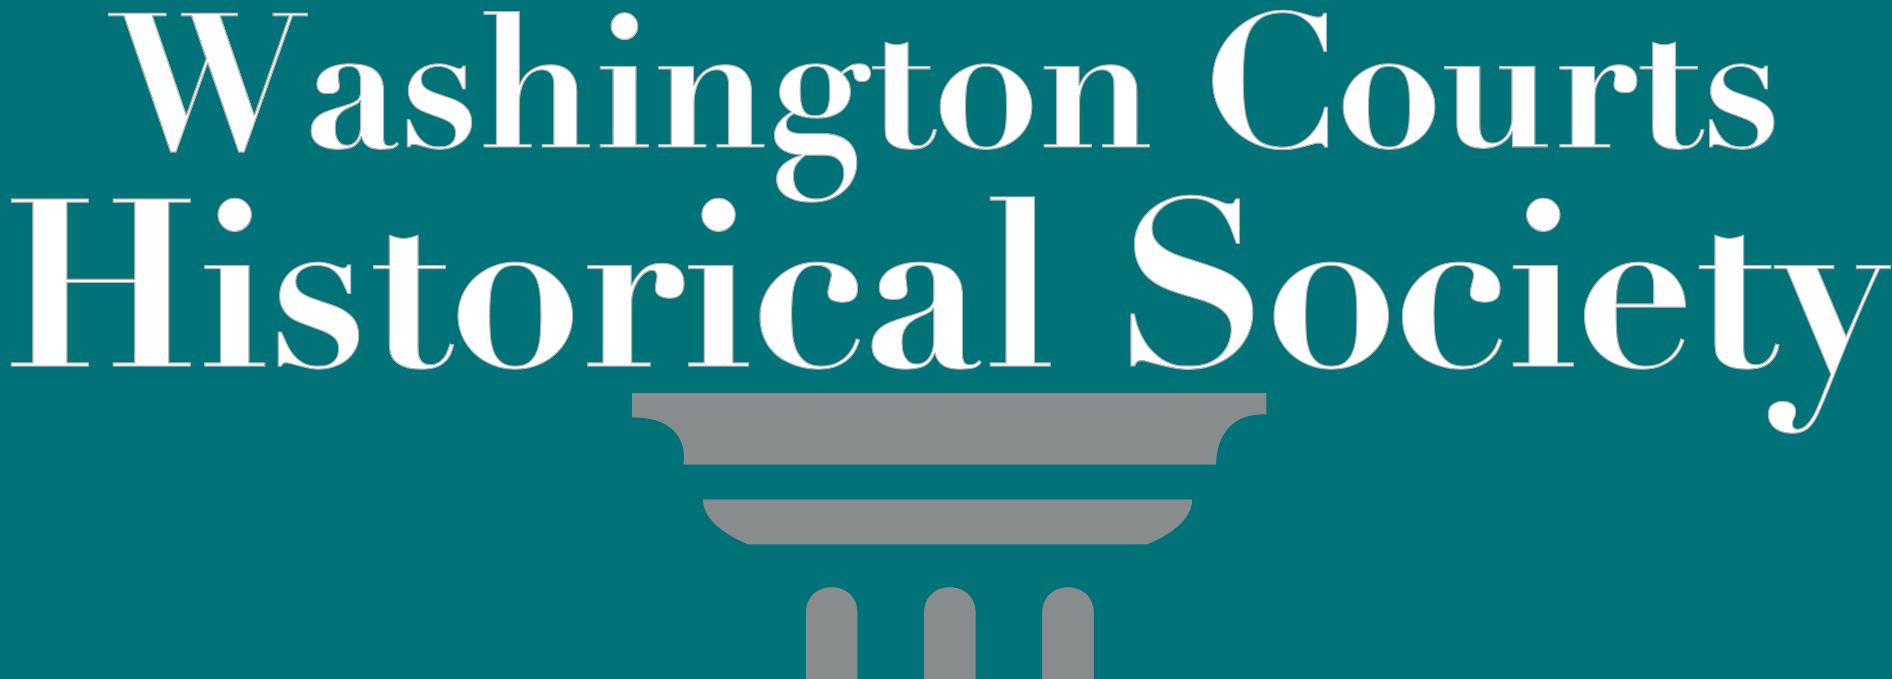 Washington Courts Historical Society